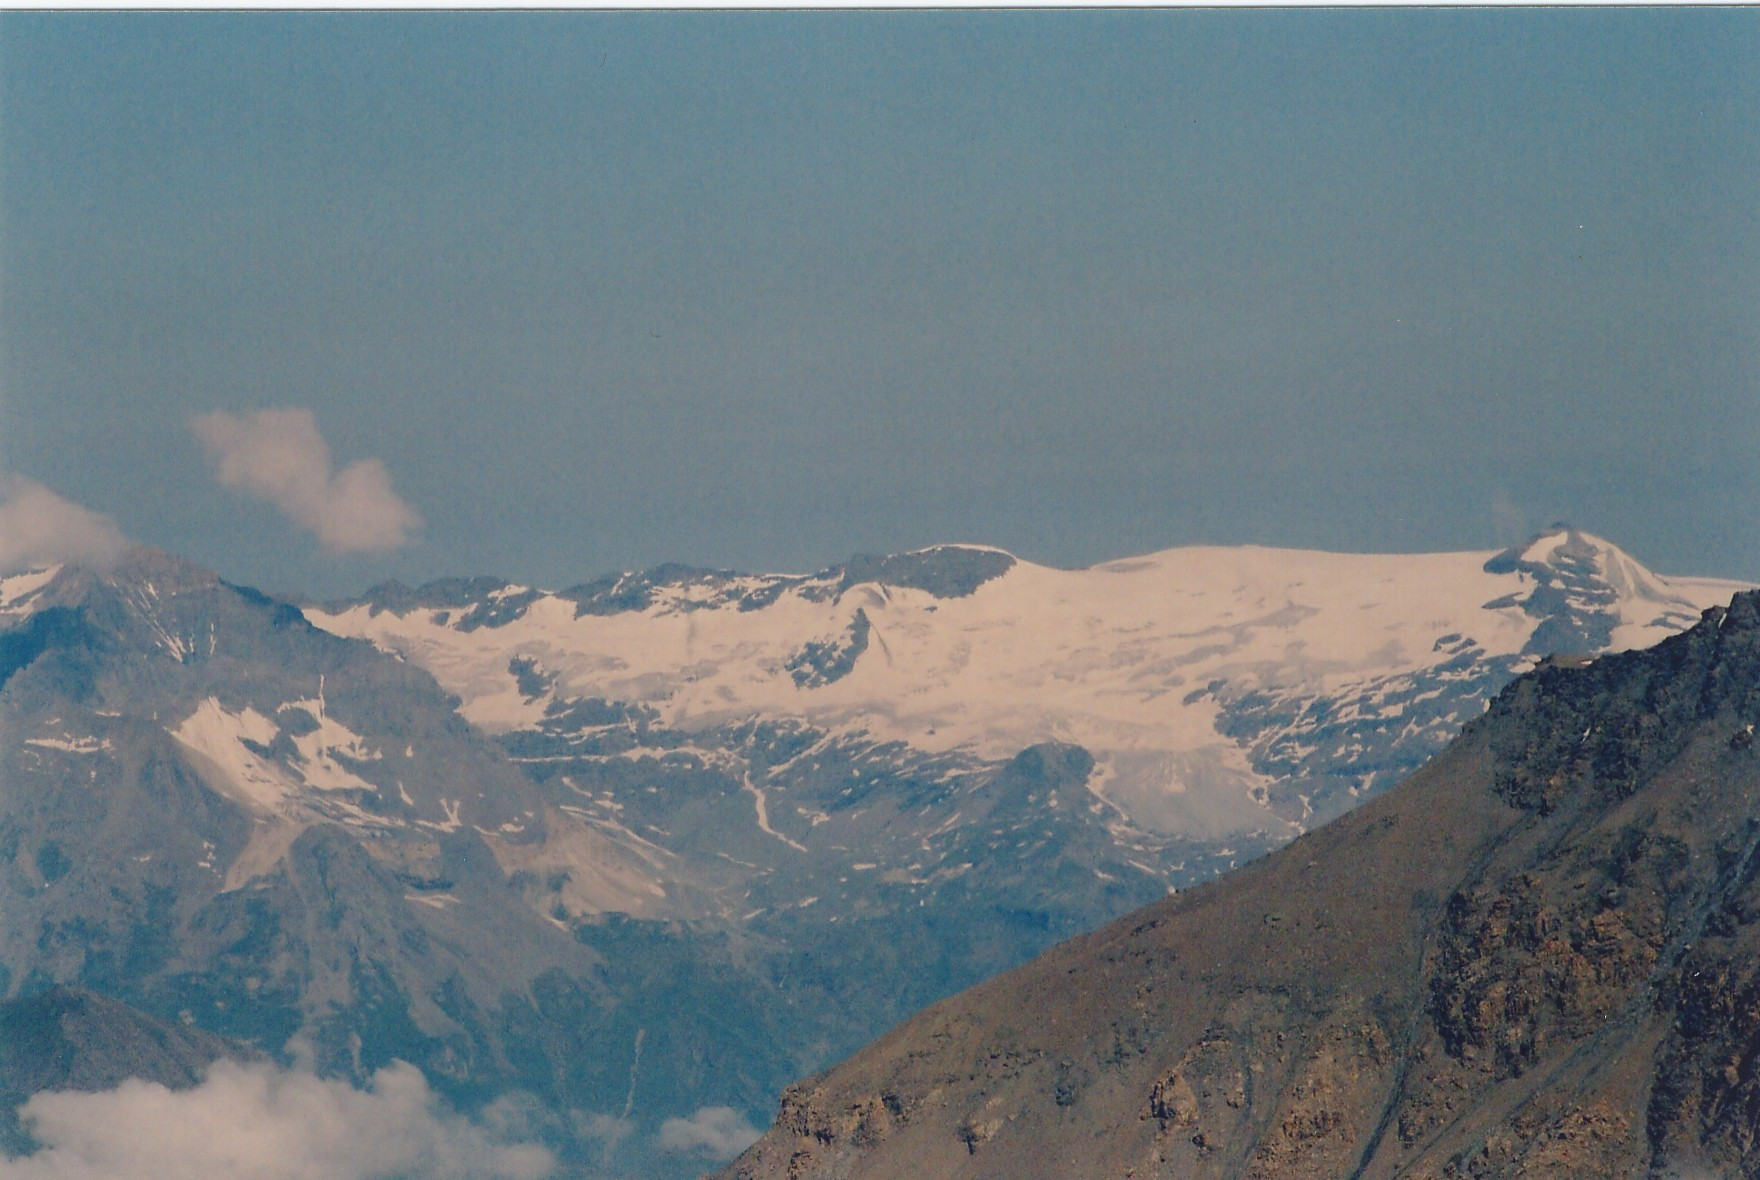 Ghiacciaio Vanoise-glaciers-de-vanoise-dal-rocciamelone-16-07-2006.jpg